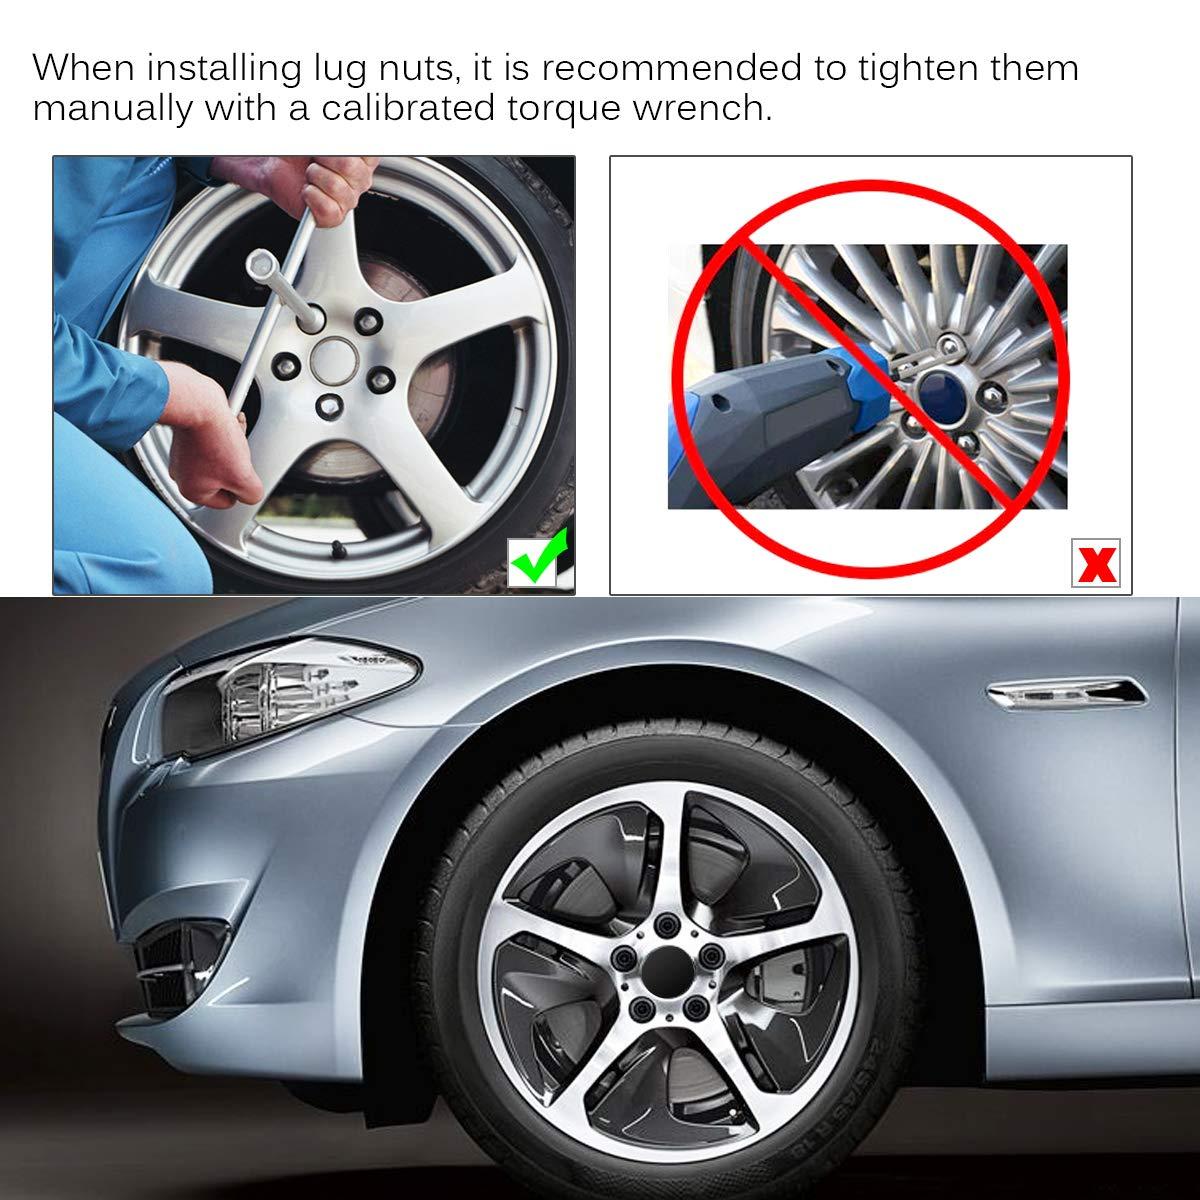 Wheel Lug Nuts Bulge Acorn Spline 1.38 Tall with 1 Lug Nut Key Compatible for Jeep Dodge Ford Wrangler Liberty Nitro Edge Mustang Commander etc 20+1Pcs PUENGSI Lug Nuts 1//2 x 20 Black